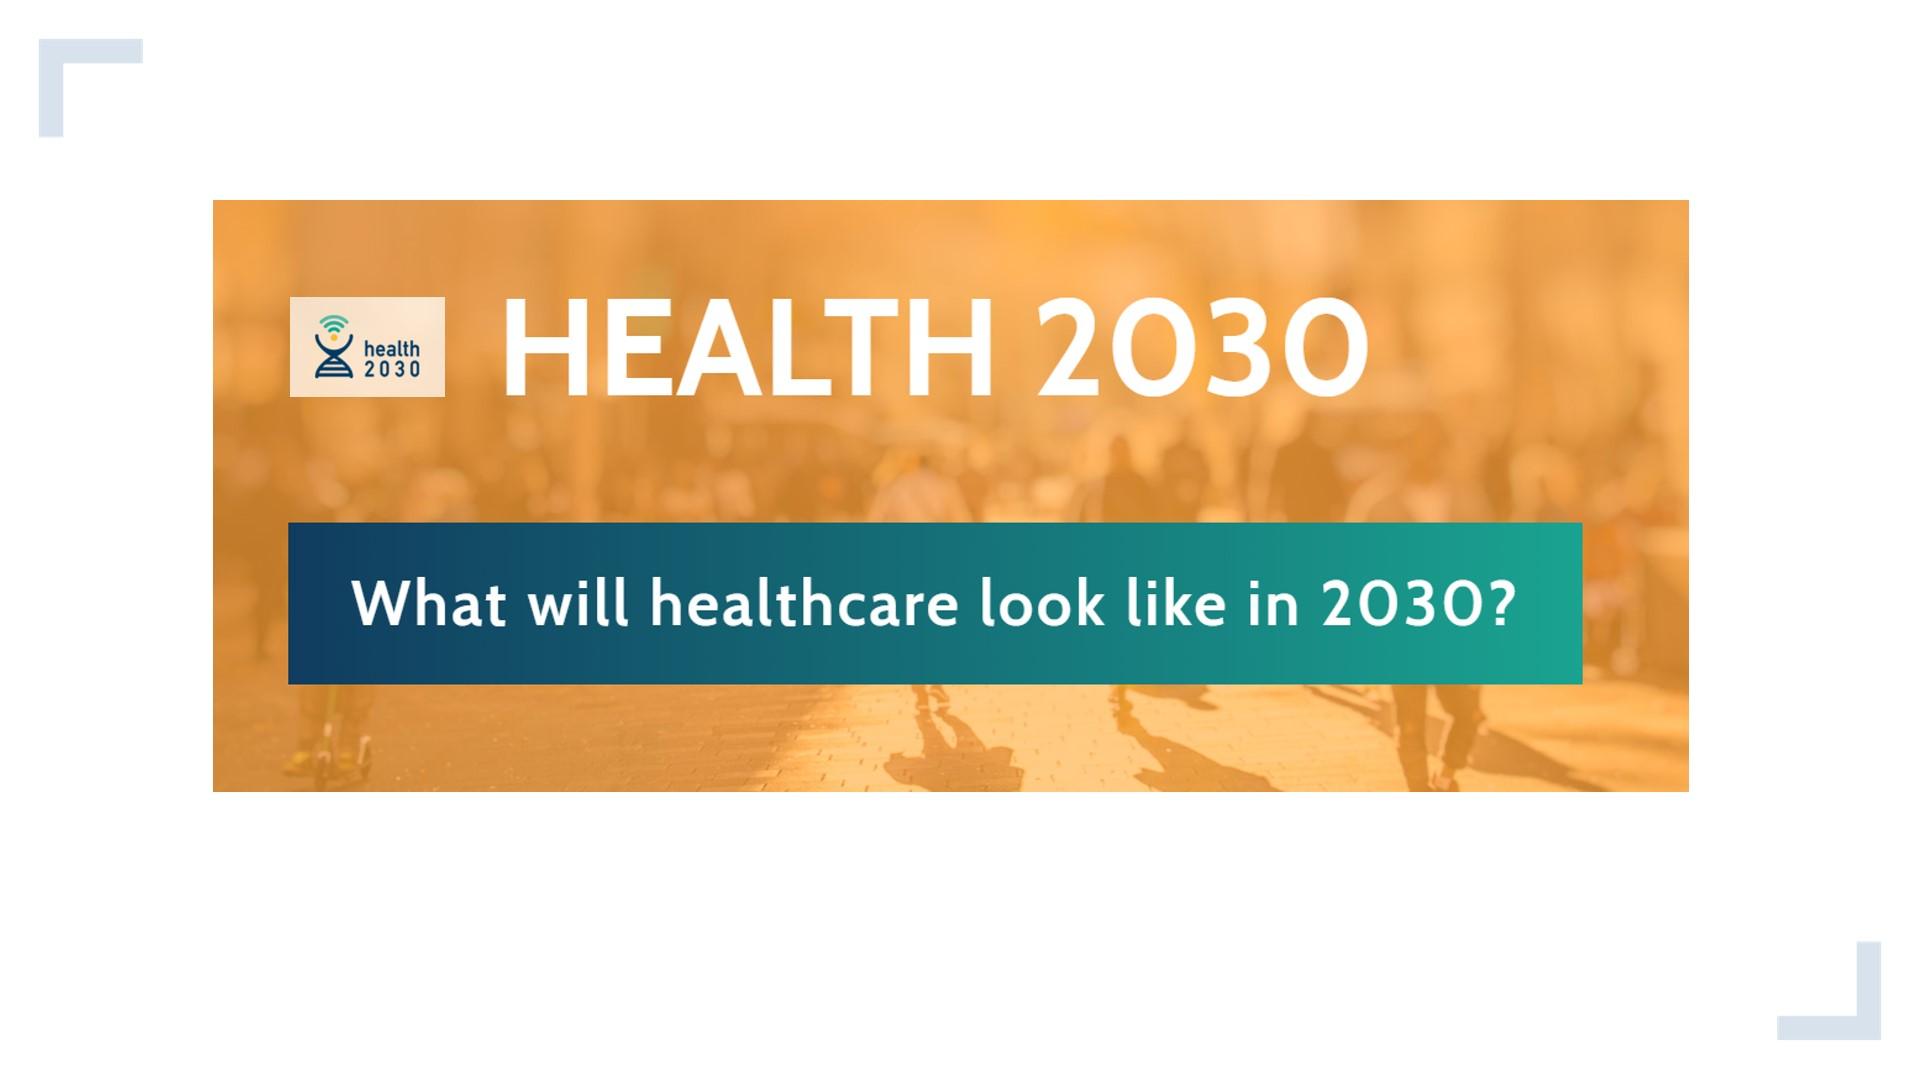 Health2030